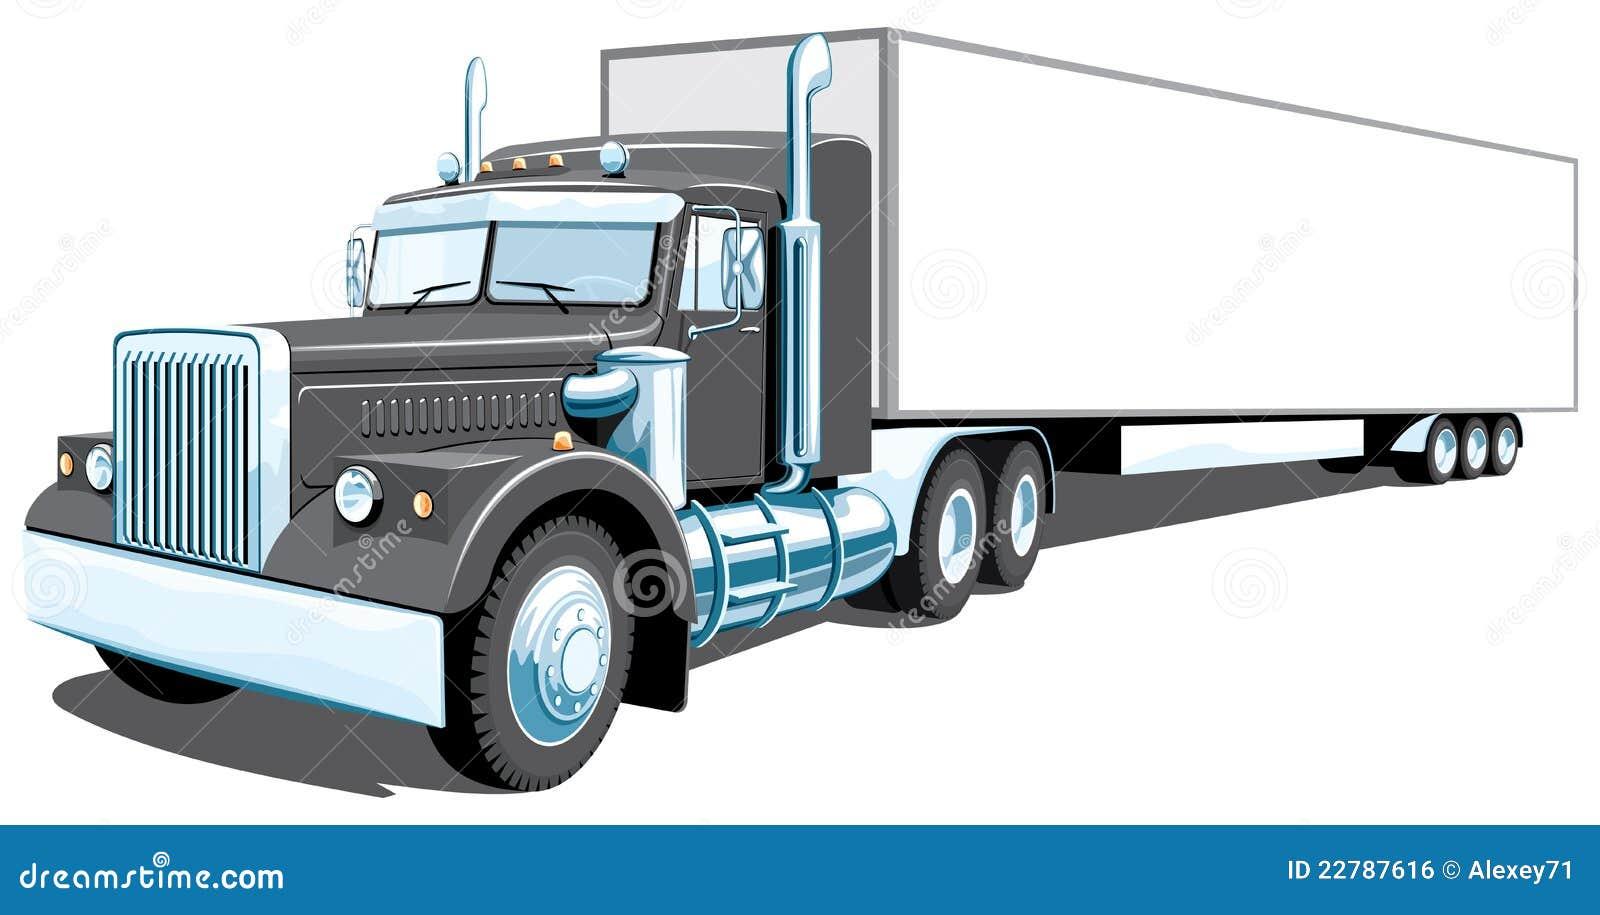 18 Wheeler Prices >> Black semi truck stock vector. Illustration of business - 22787616